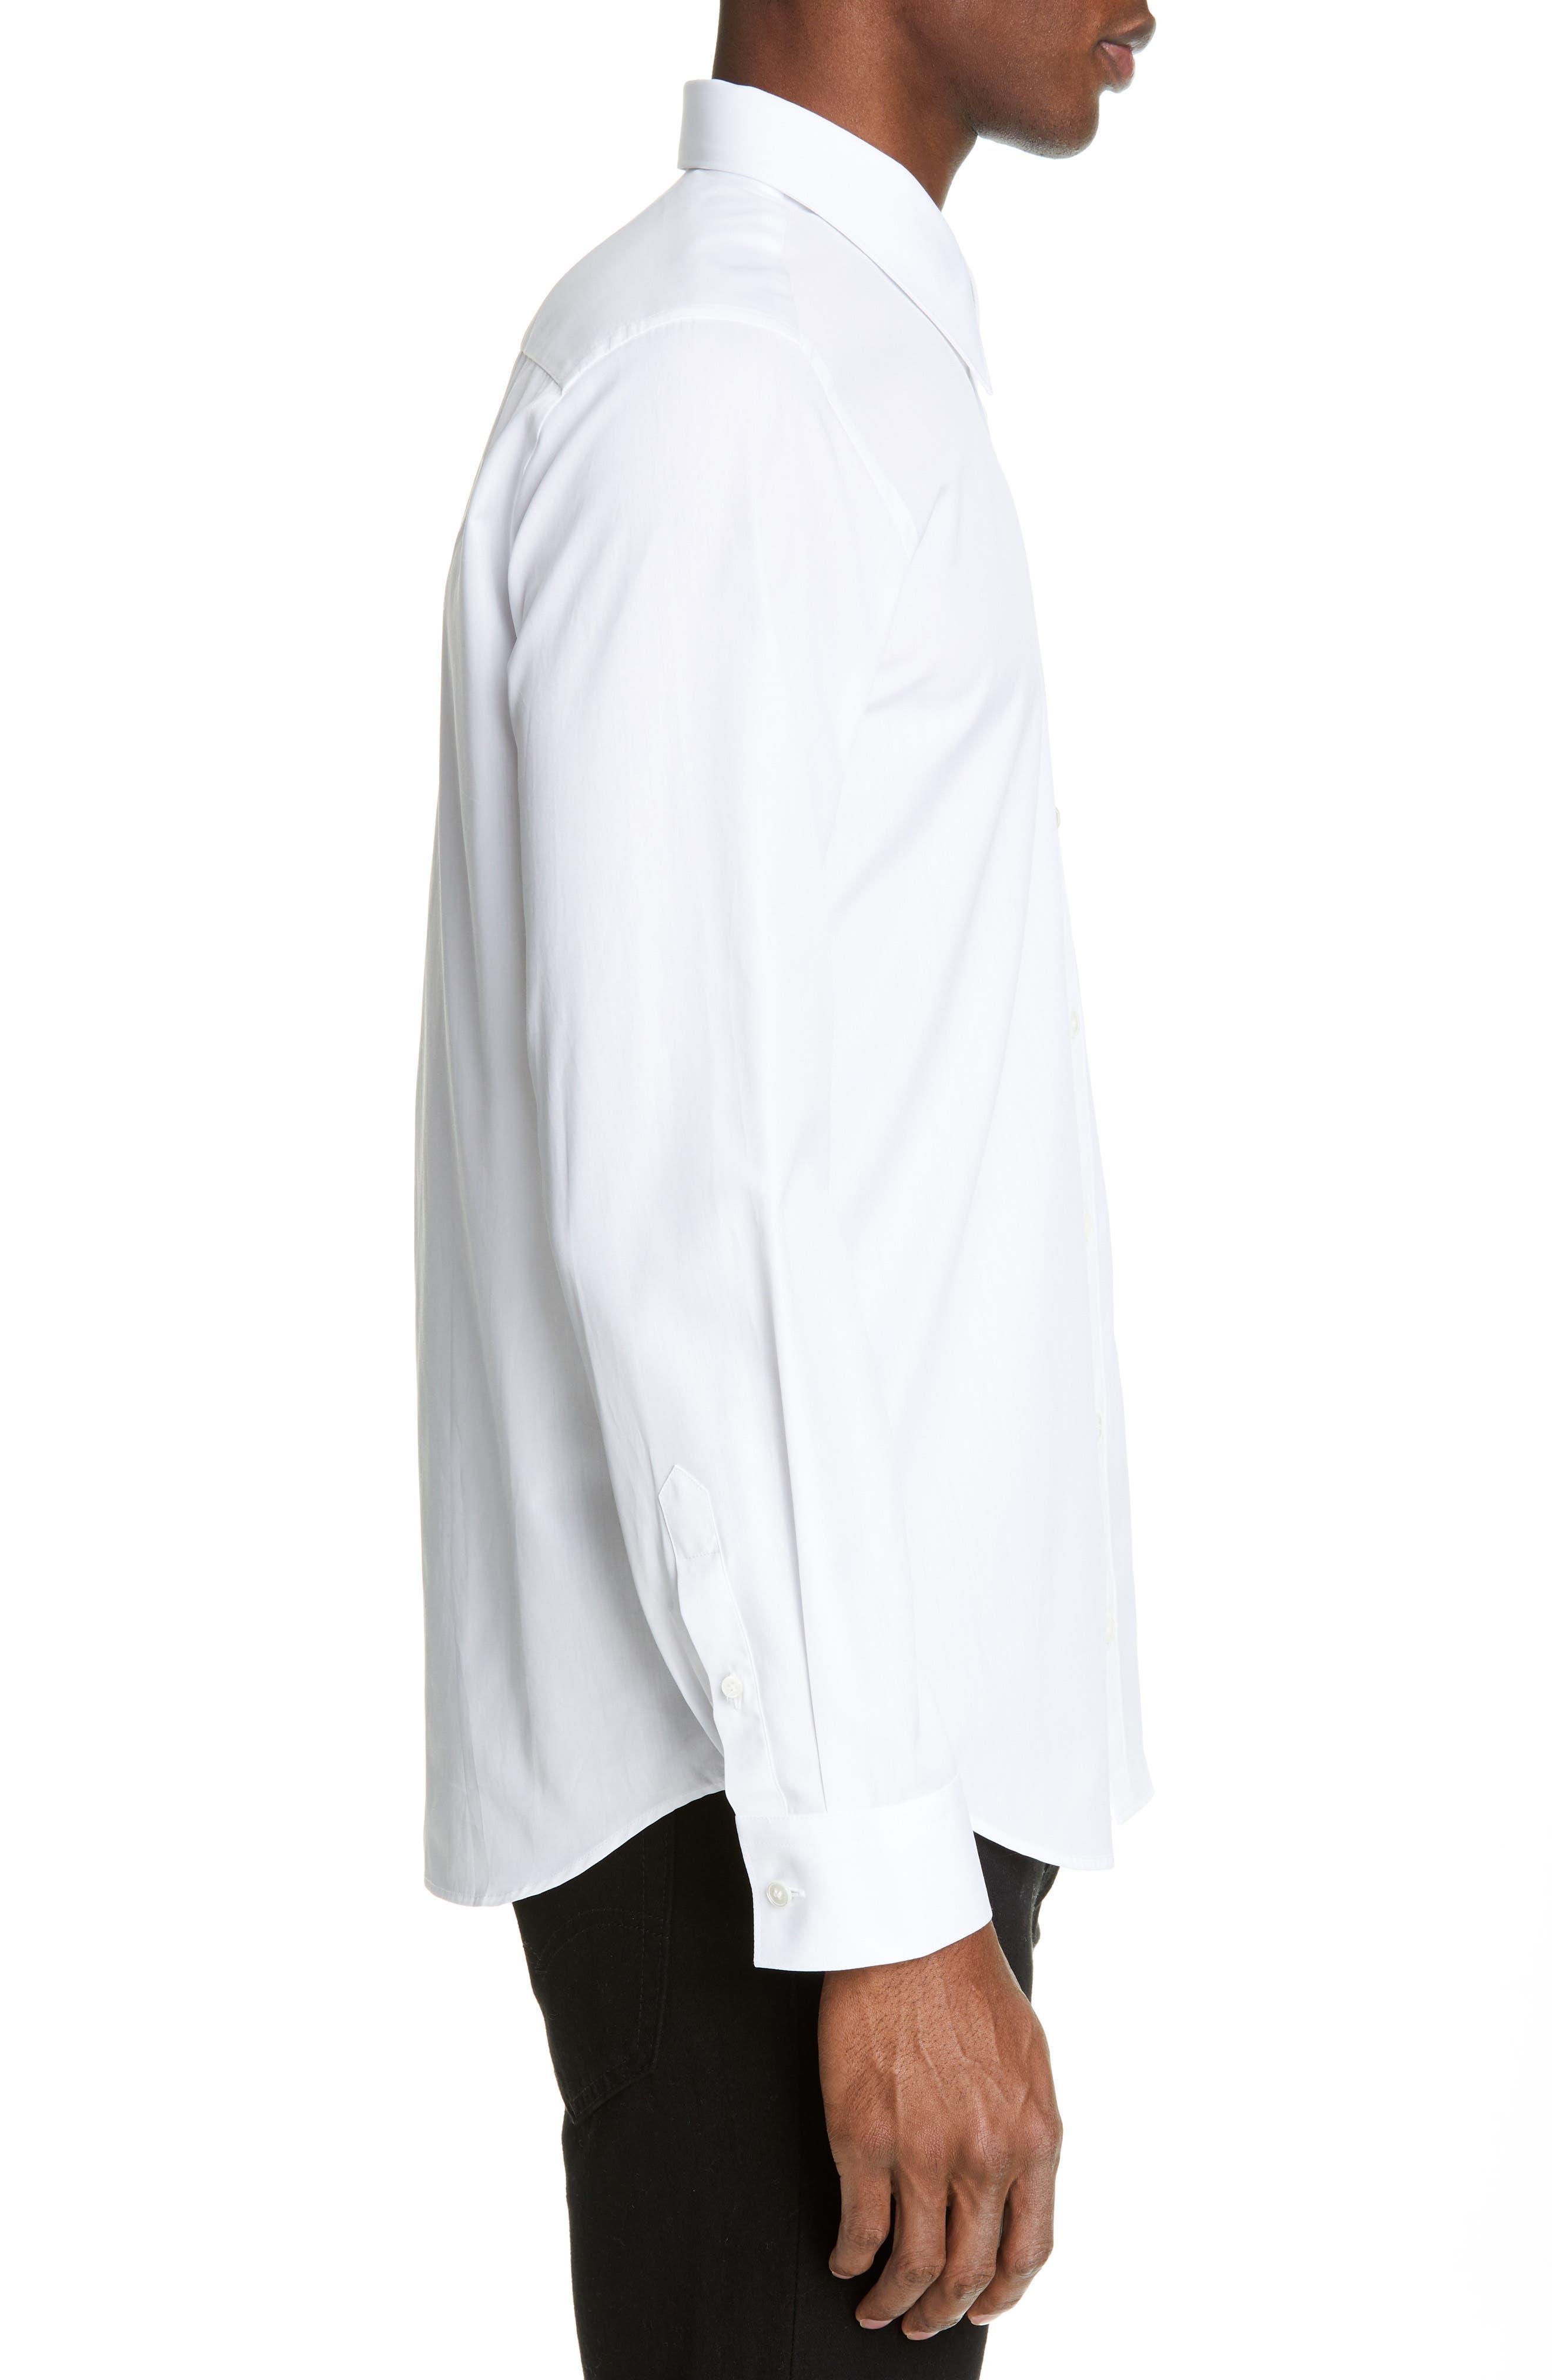 HELMUT LANG, Logo Print Dress Shirt, Alternate thumbnail 4, color, WHITE/SILVER